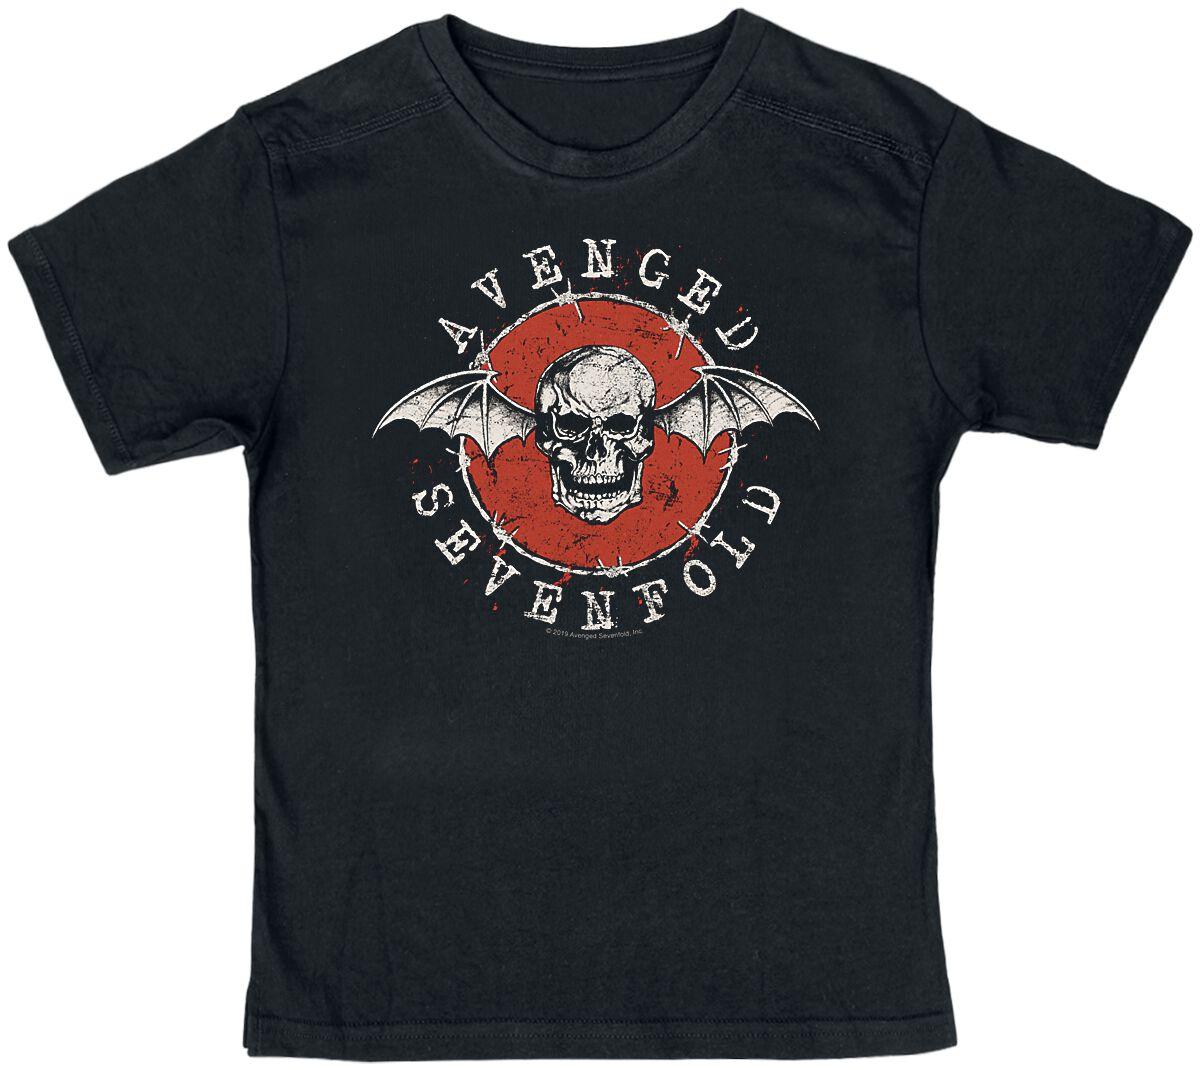 Image of Avenged Sevenfold New Deathbat Kinder-Shirt schwarz